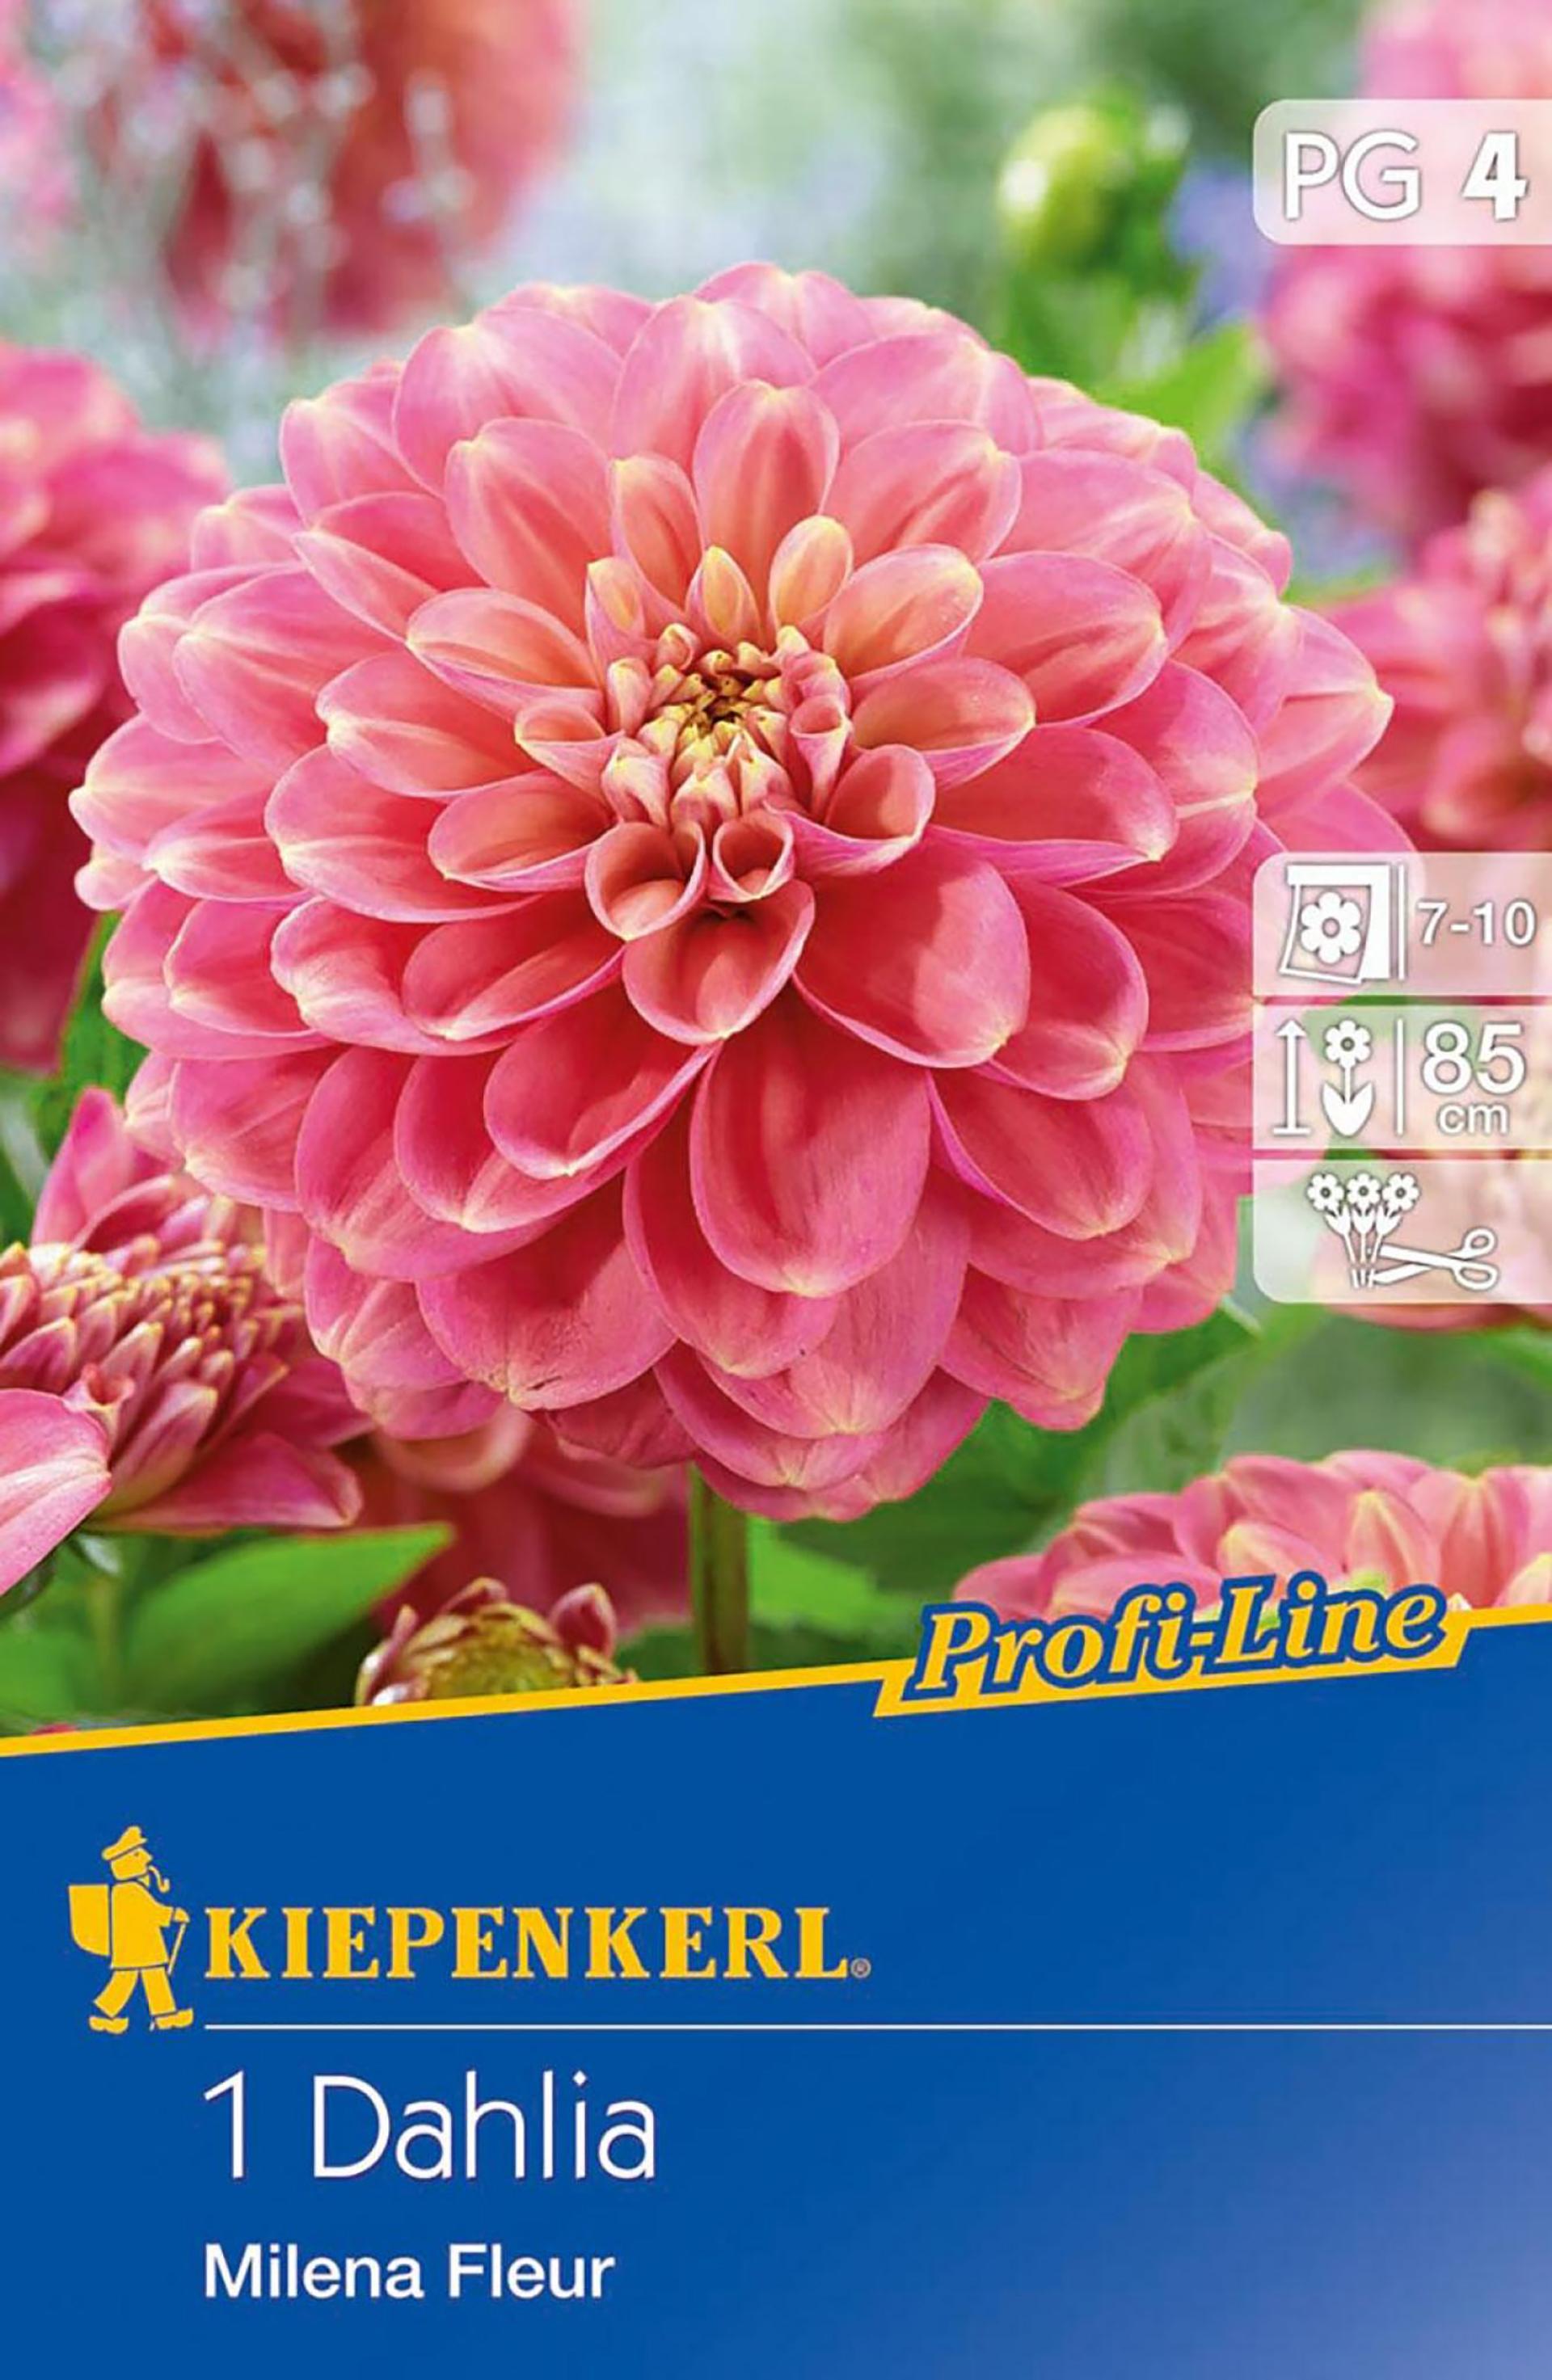 Dahlie Milena Fleur PG-4